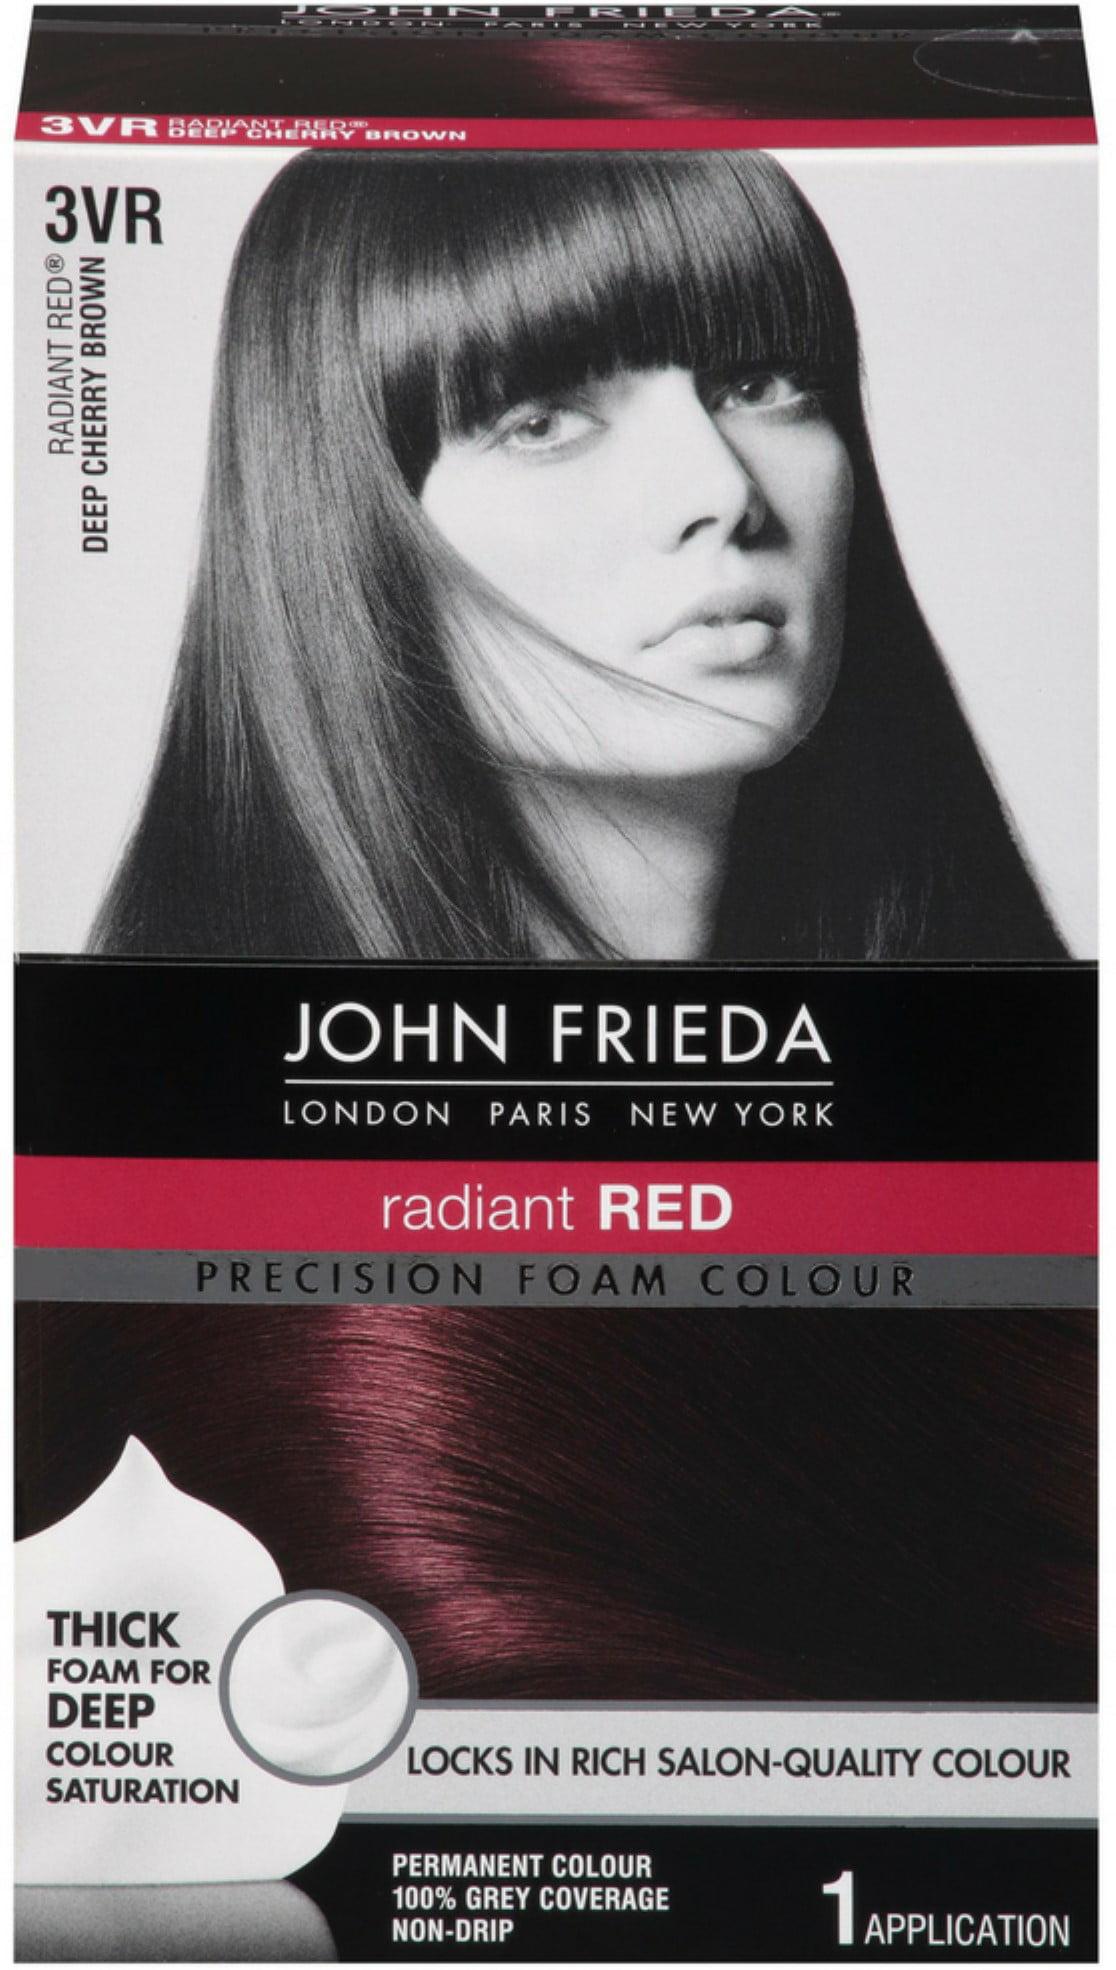 John Frieda Precision Foam Colour Radiant Red Deep Cherry Brown 3vr 1 Each Walmart Com Walmart Com